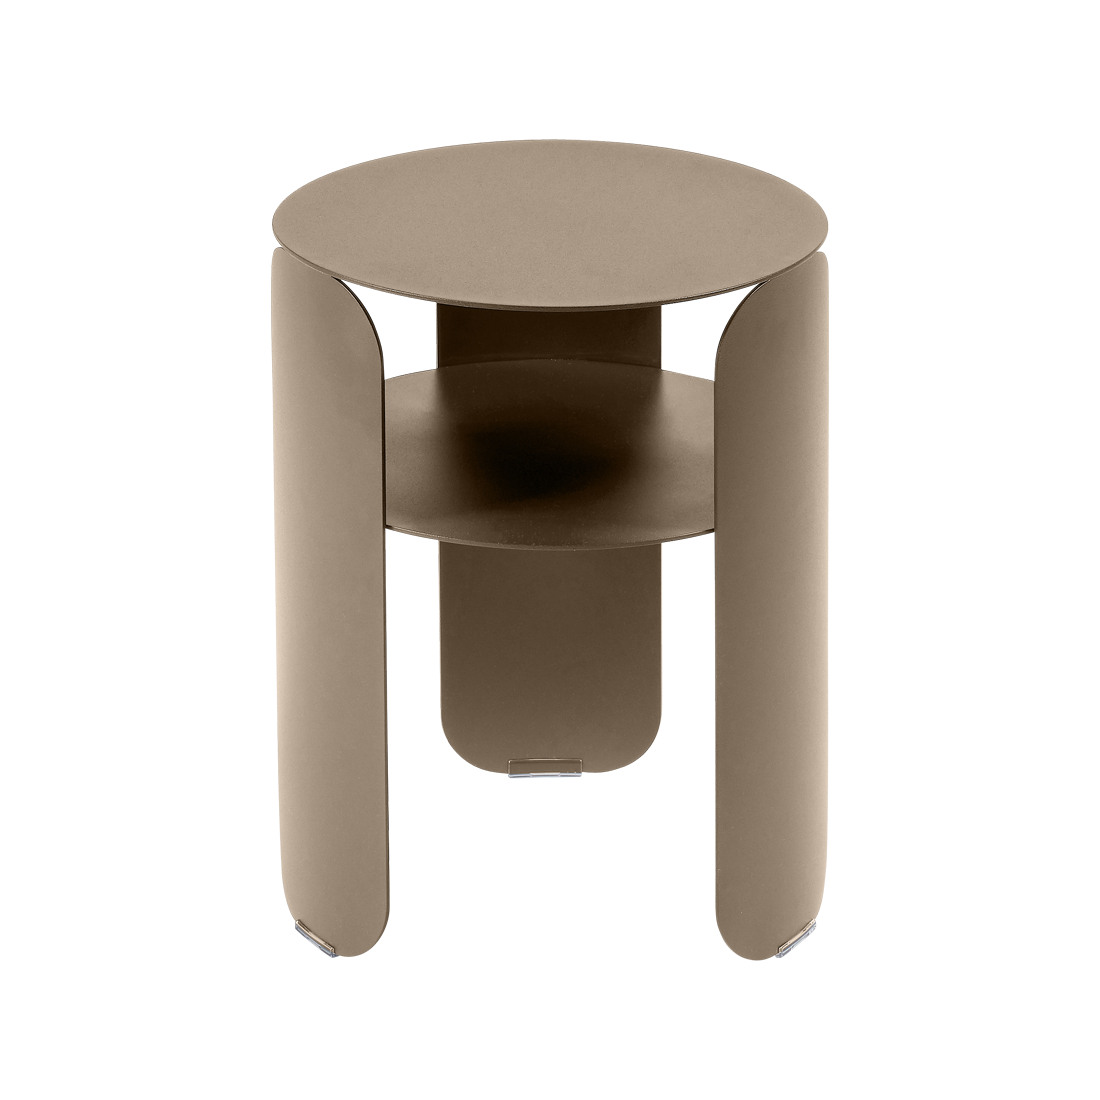 table d'appoint en metal, table de chevet metal, table d appoint bebop, table chevet fermob, petite table basse beige